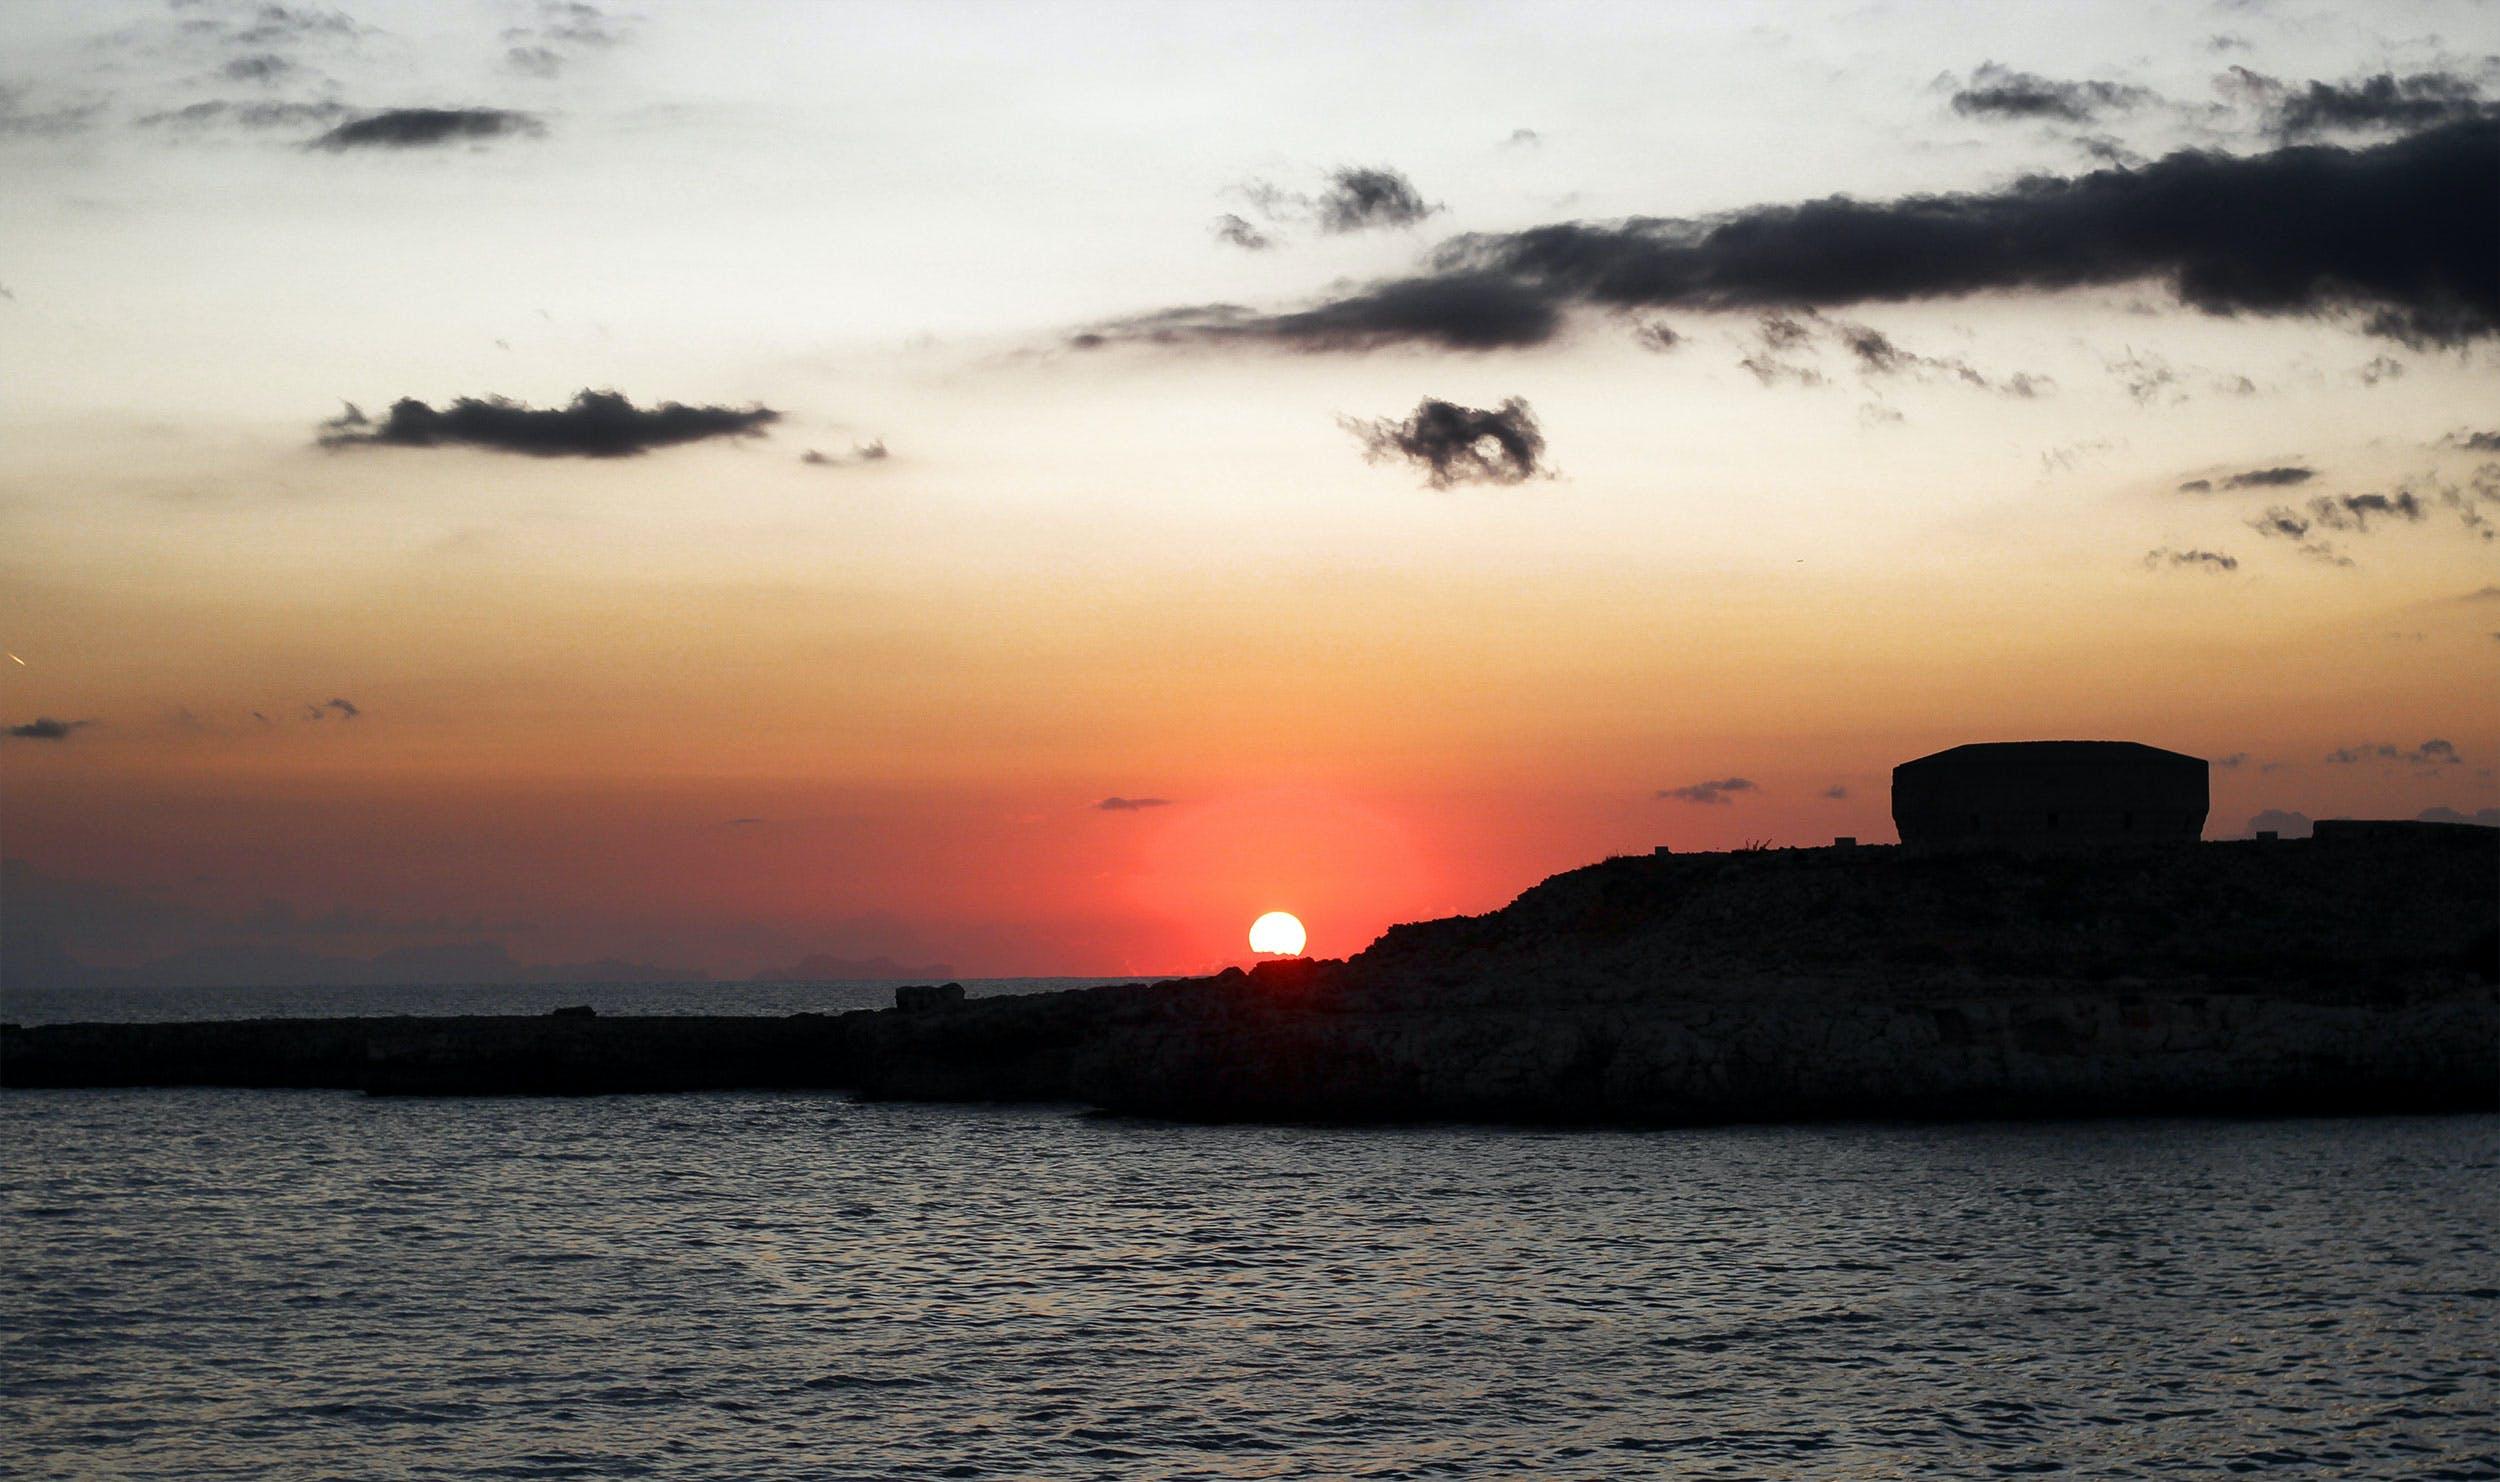 Free stock photo of beach, boat, golden sunset, happy